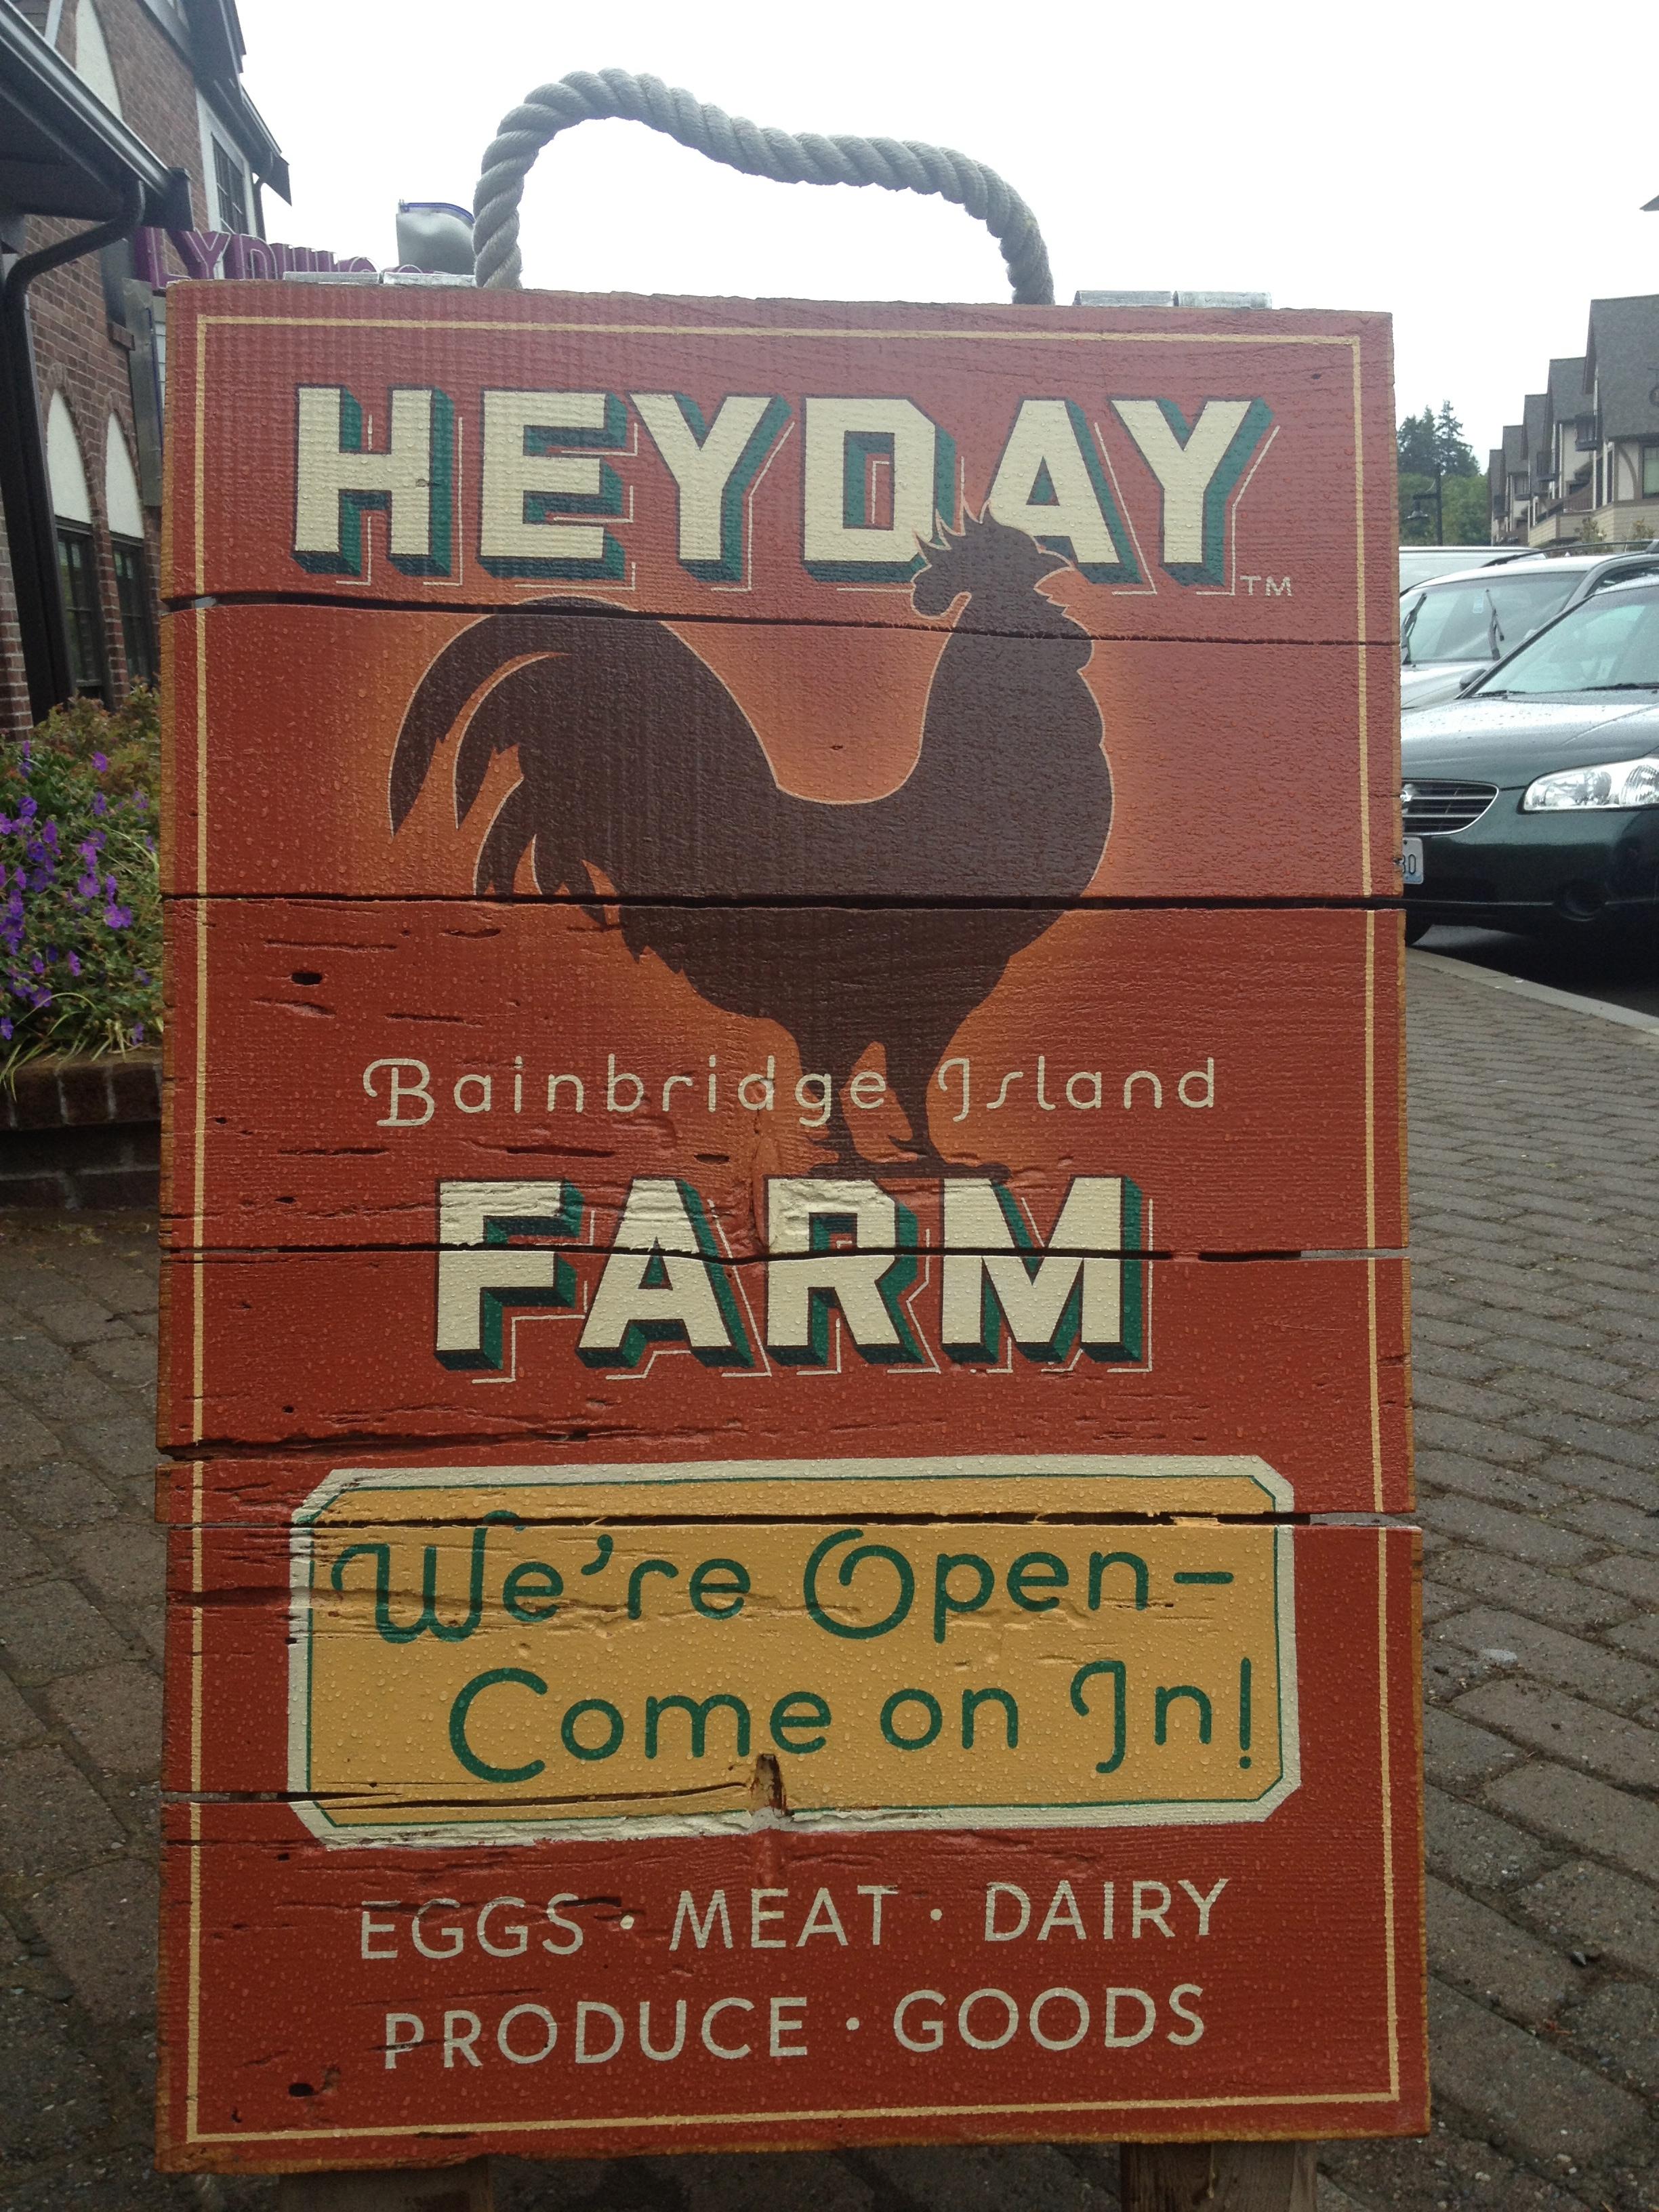 HeyDay Farm Store on Bainbridge Island.